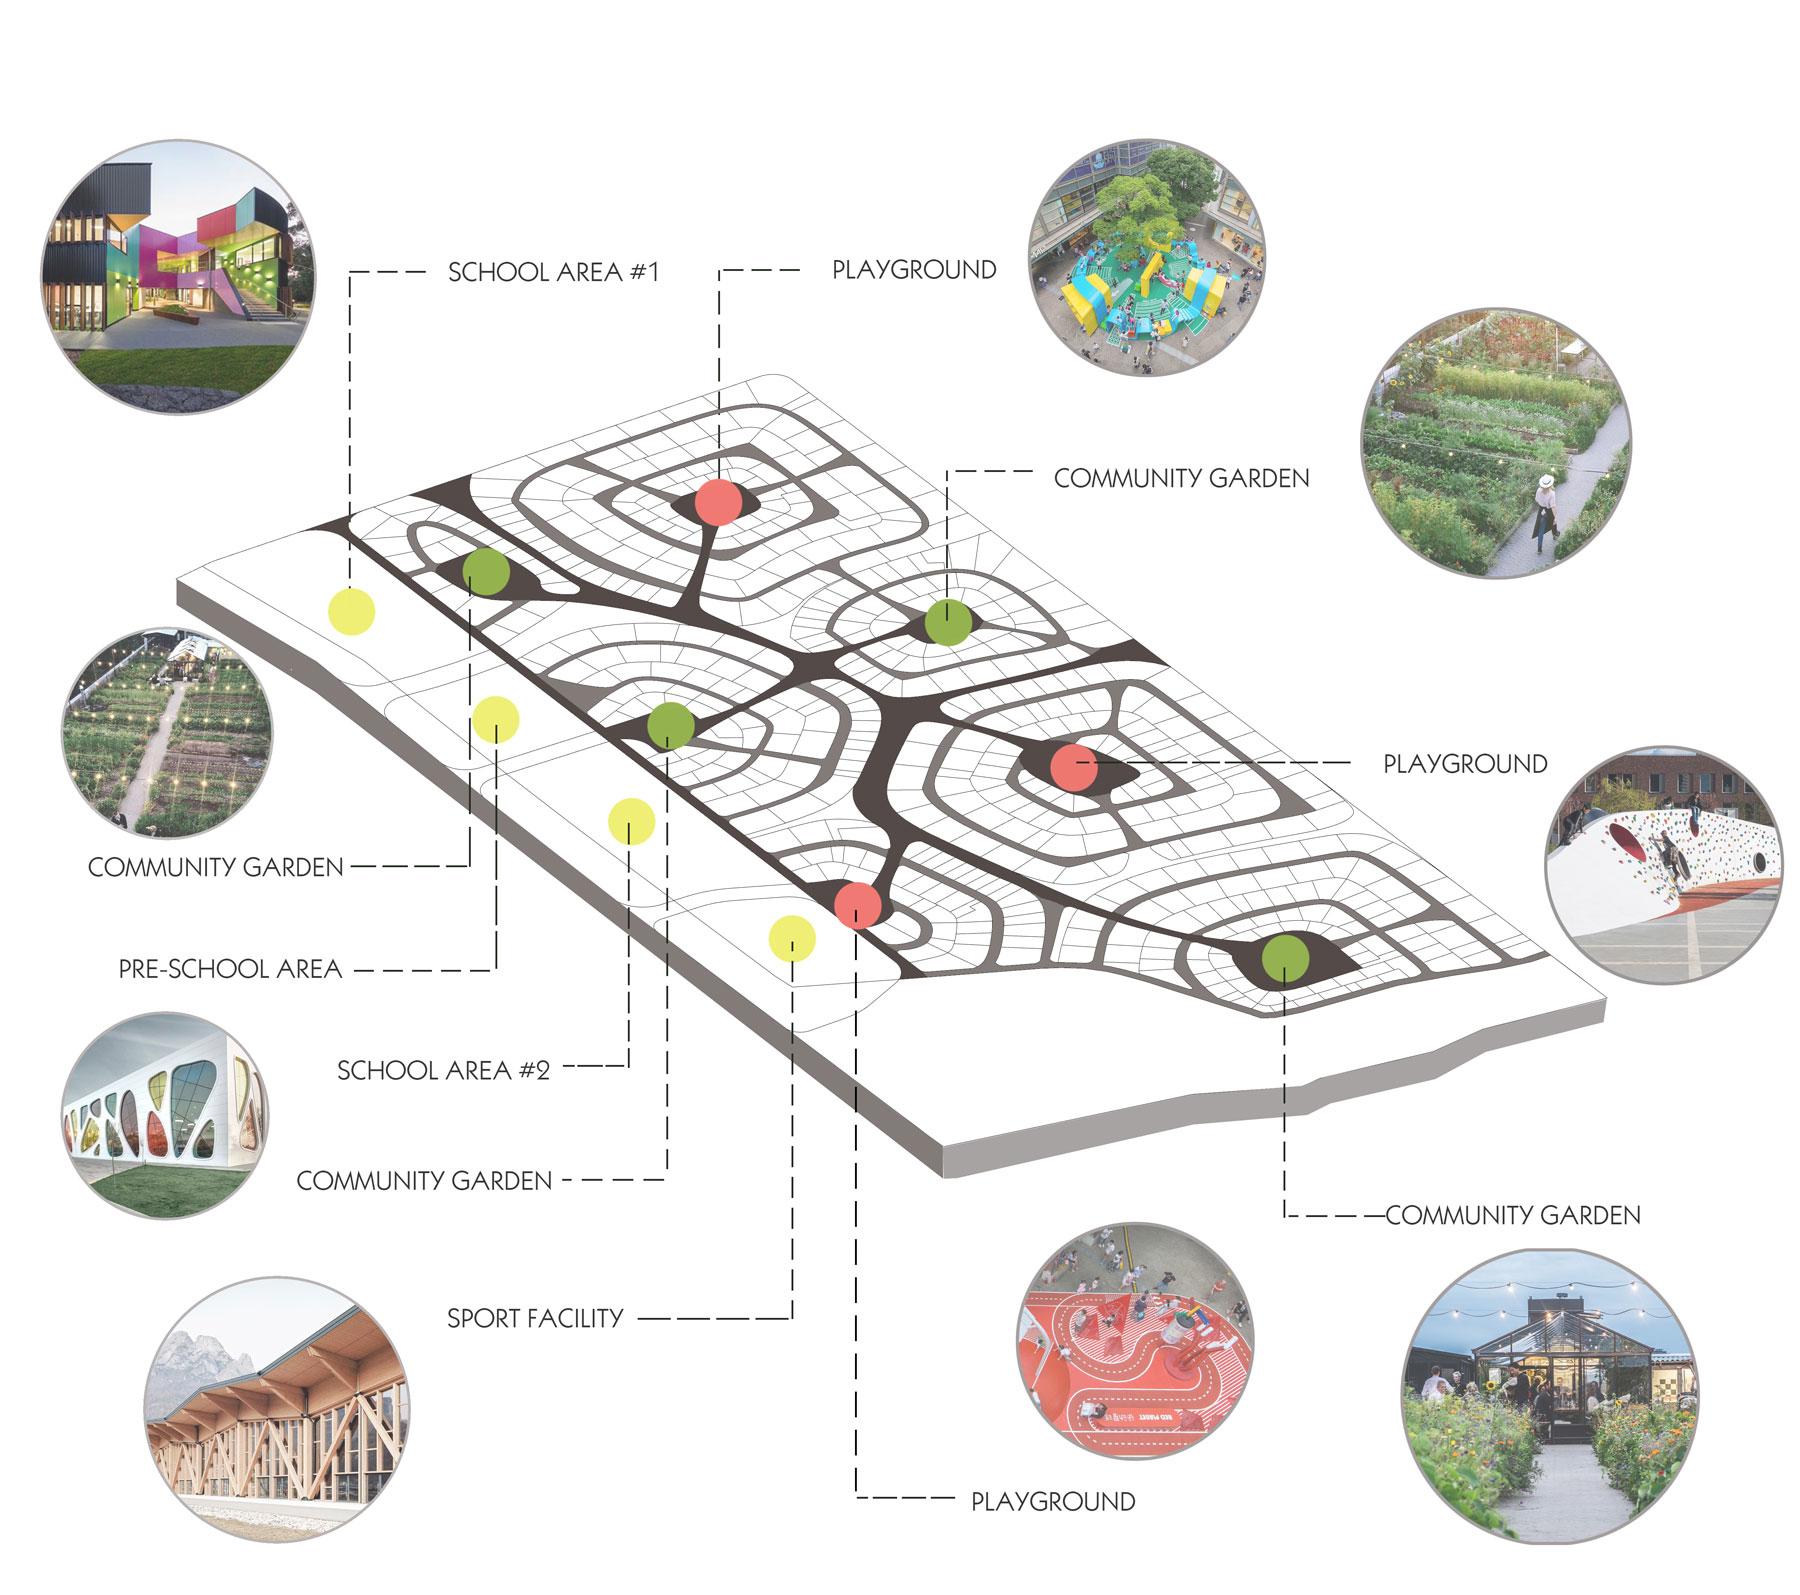 mandala-sustainable-living-warrnambool-eco-friendly-village-6